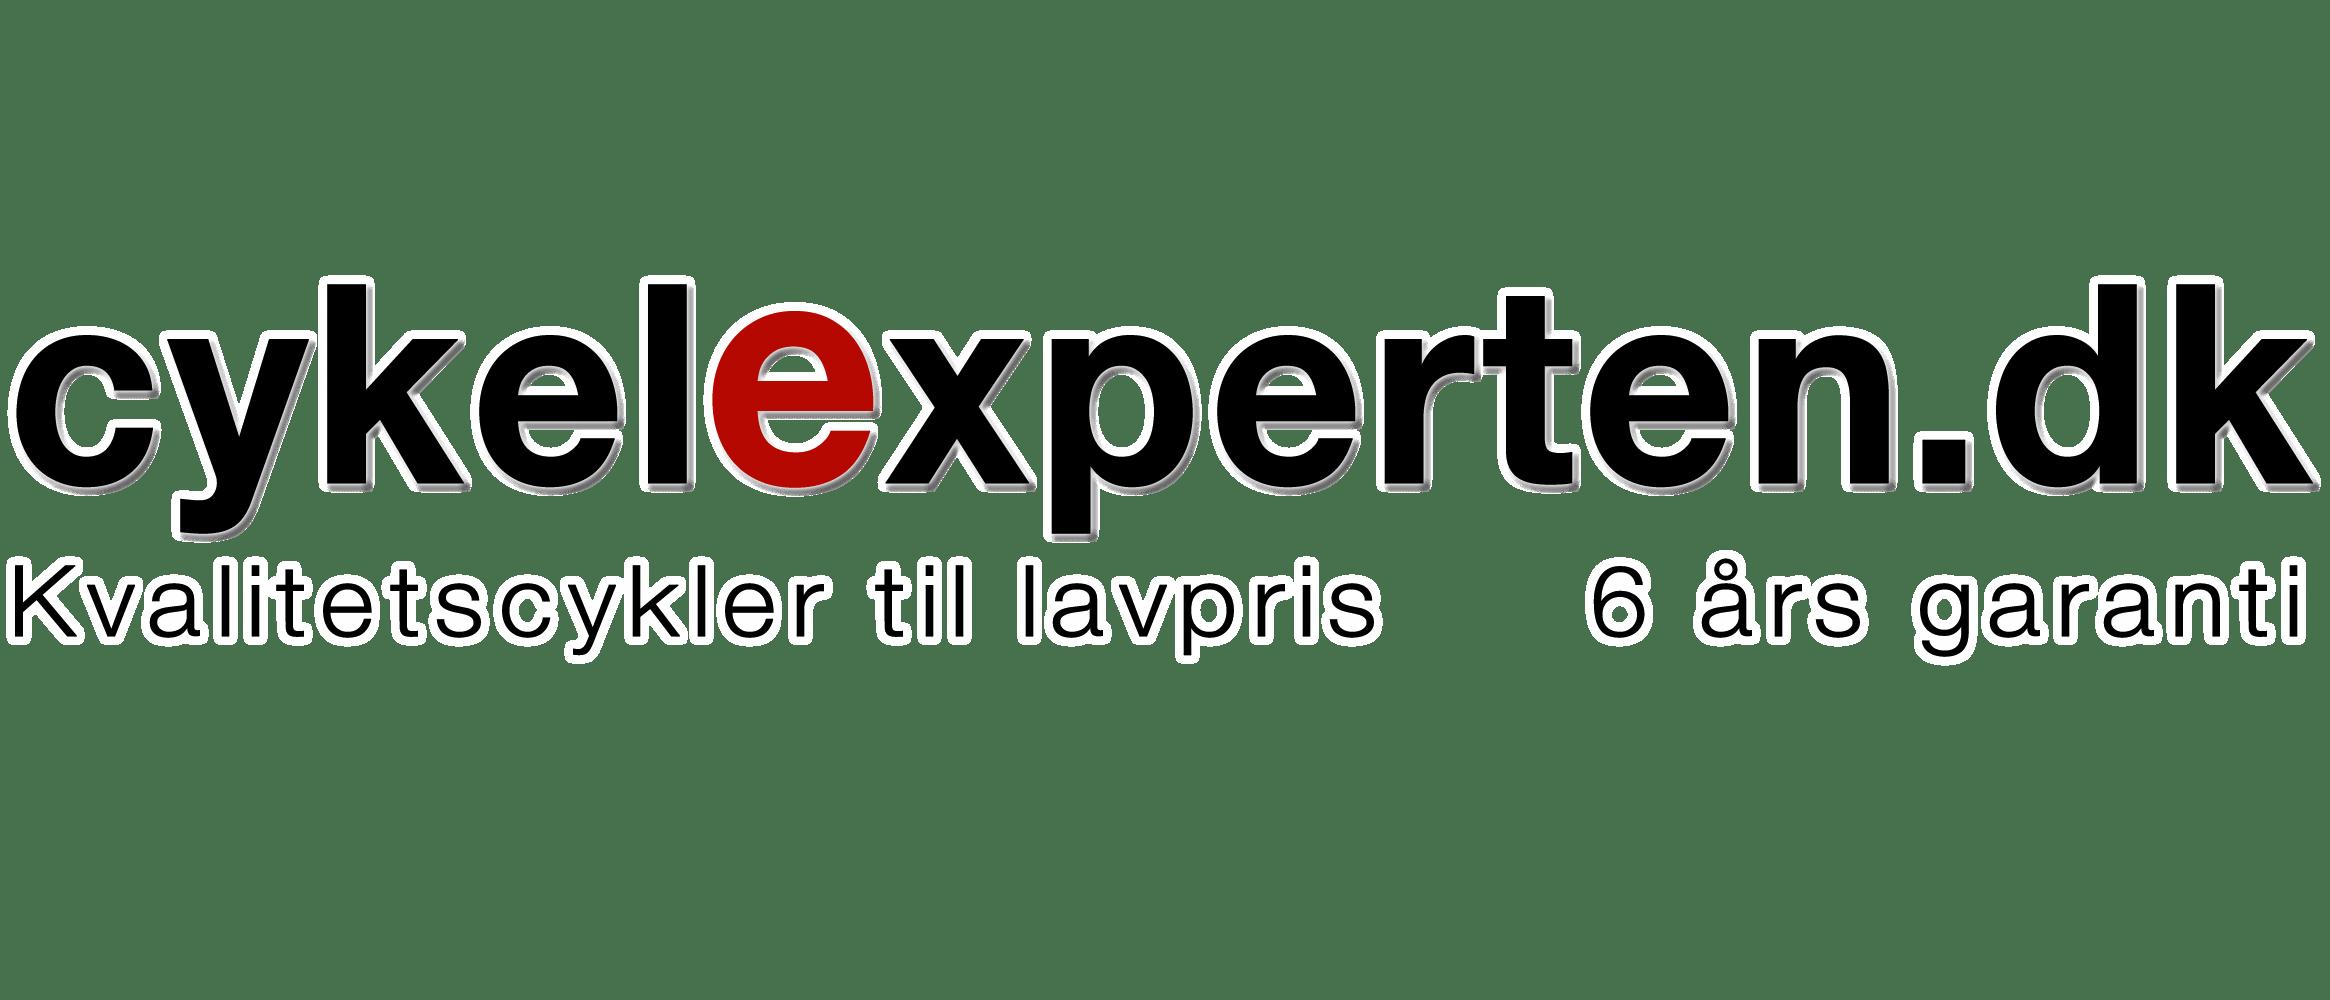 cykelexperten logo